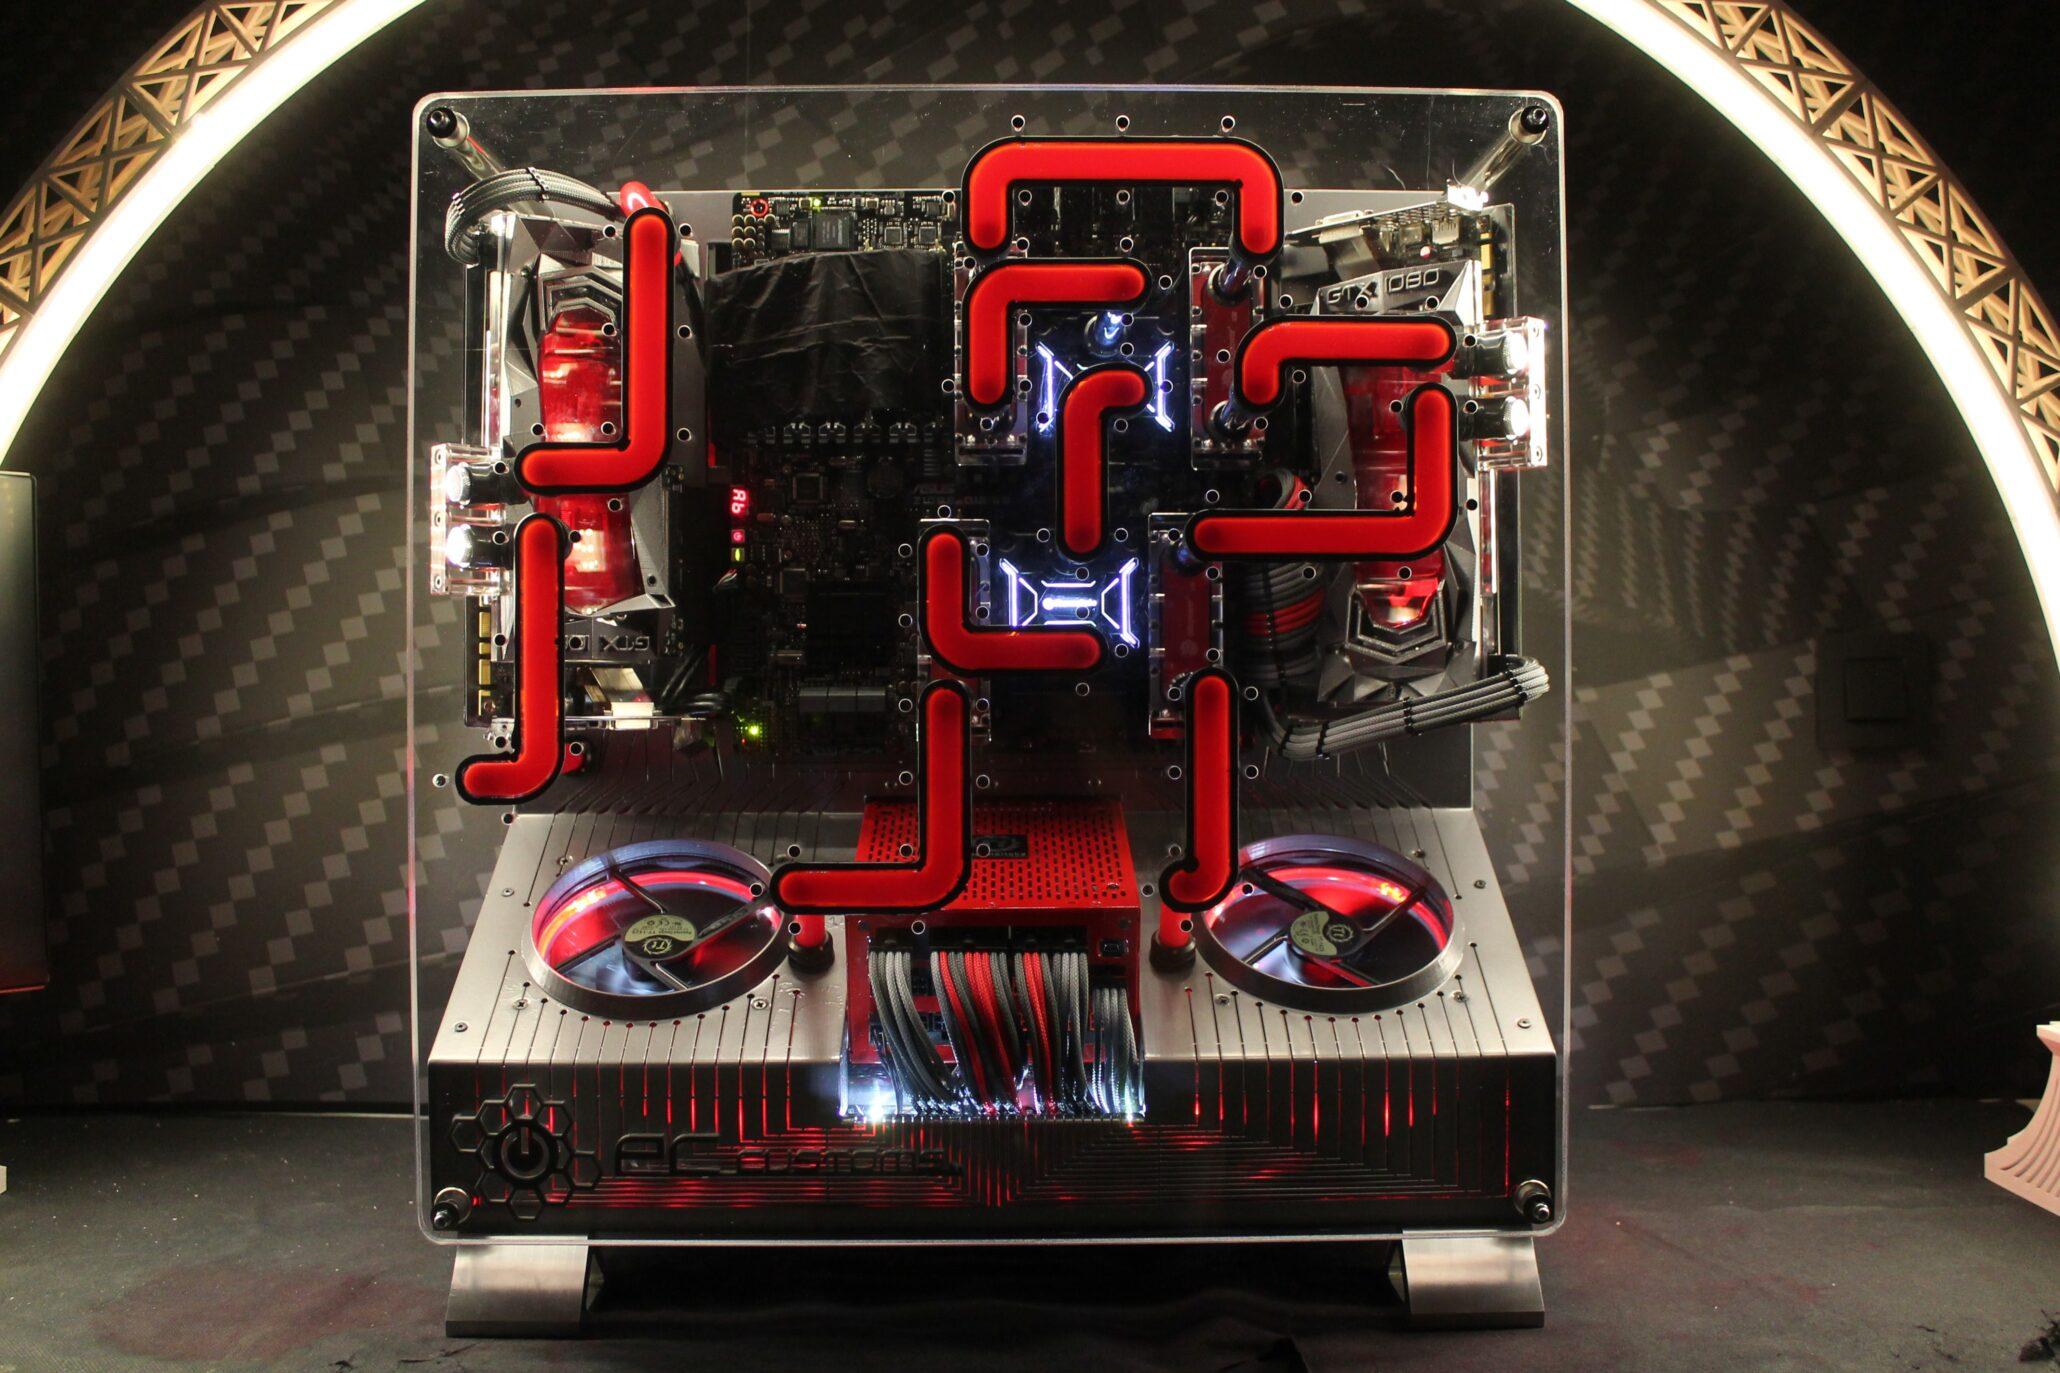 Shui-Sheng: A Reader's CES 2017 Thermaltake P5 Mod